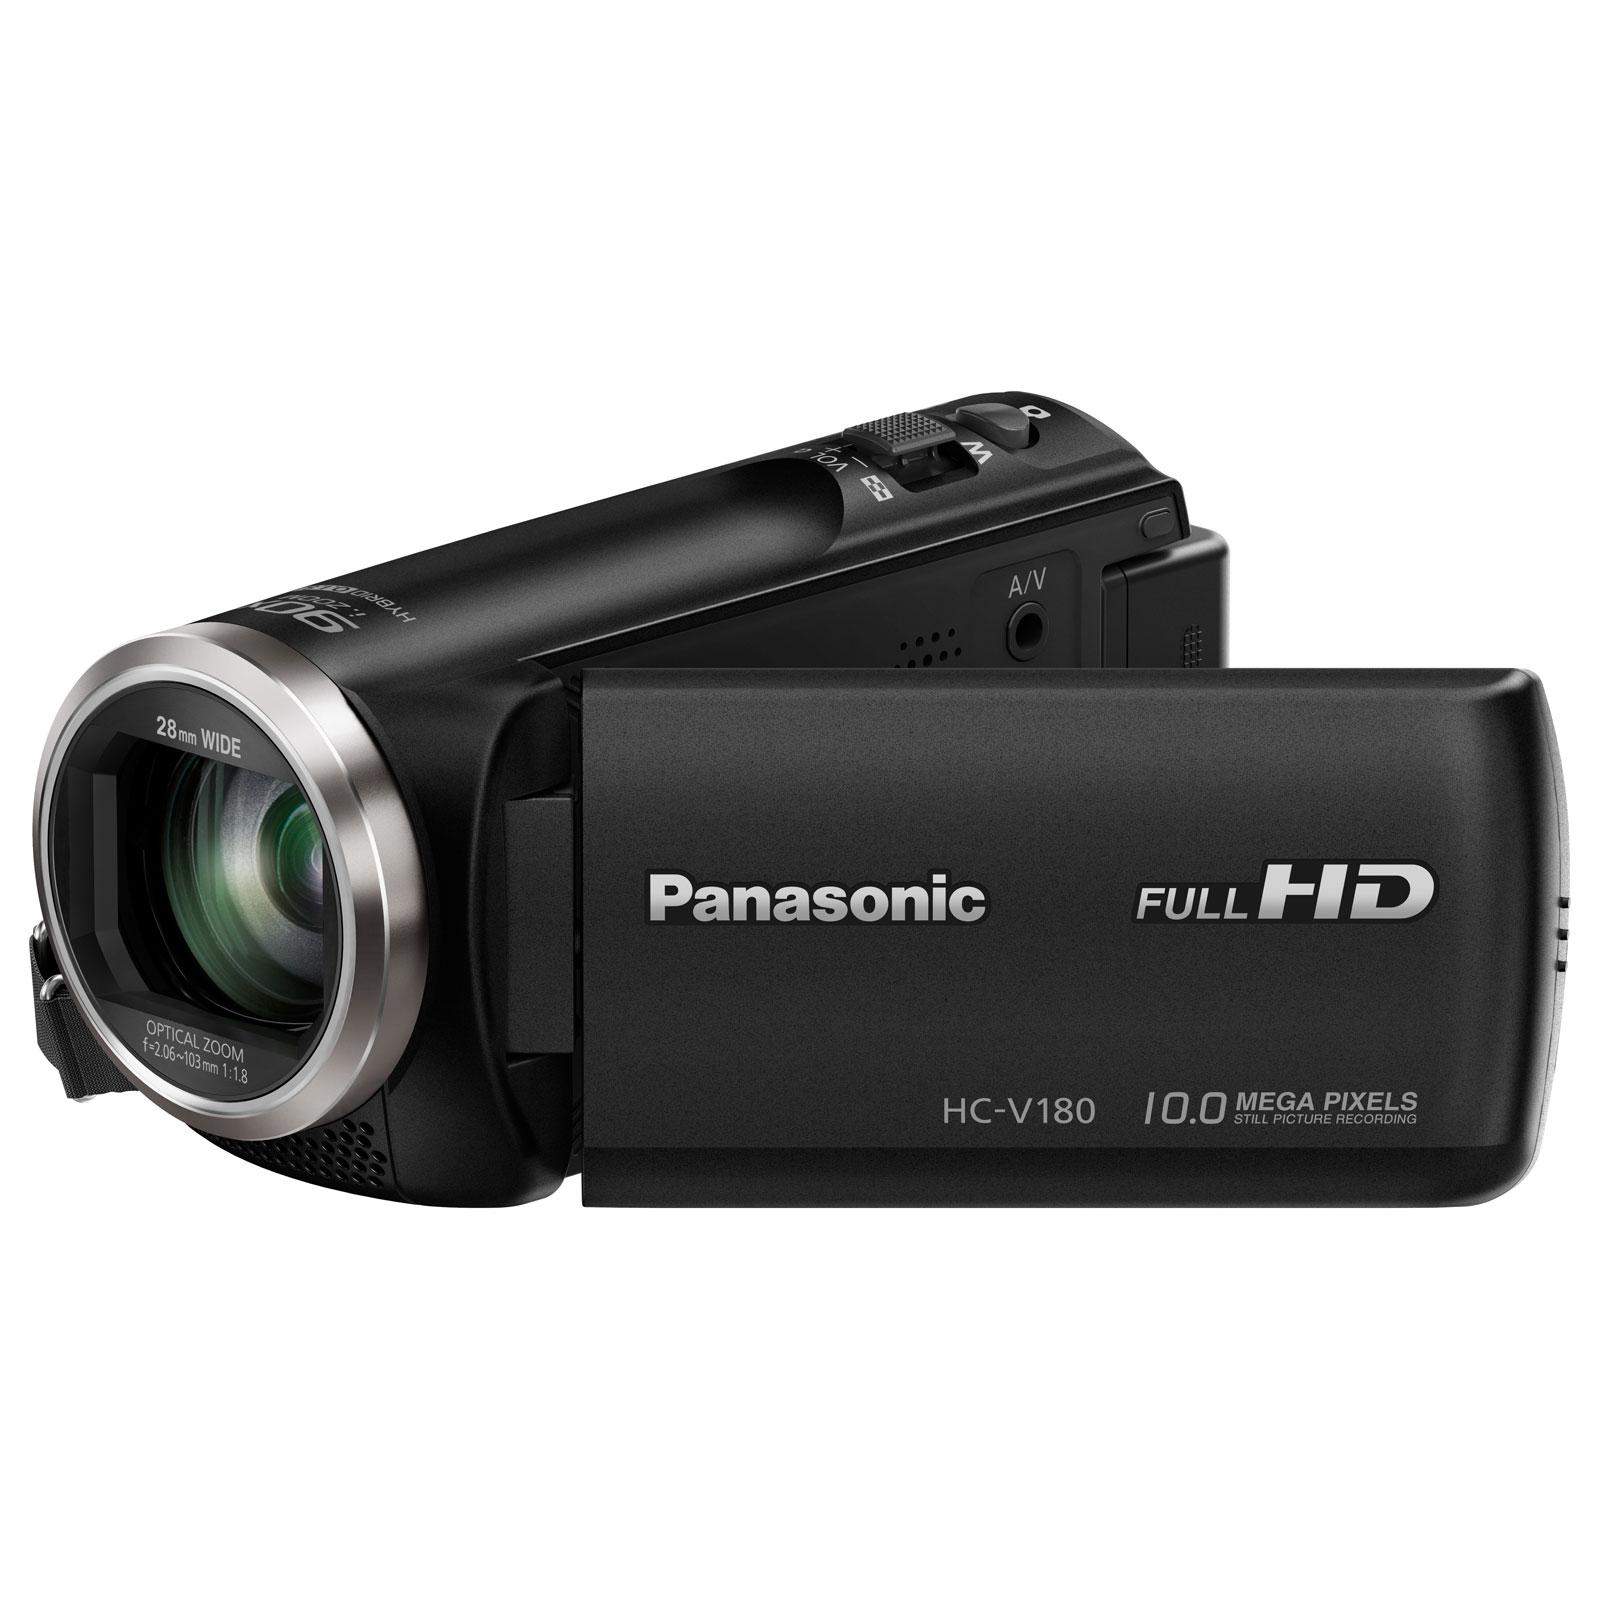 Caméscope numérique Panasonic HC-V180EF-K Caméscope Full HD grand-angle 28mm avec zoom optique 50x